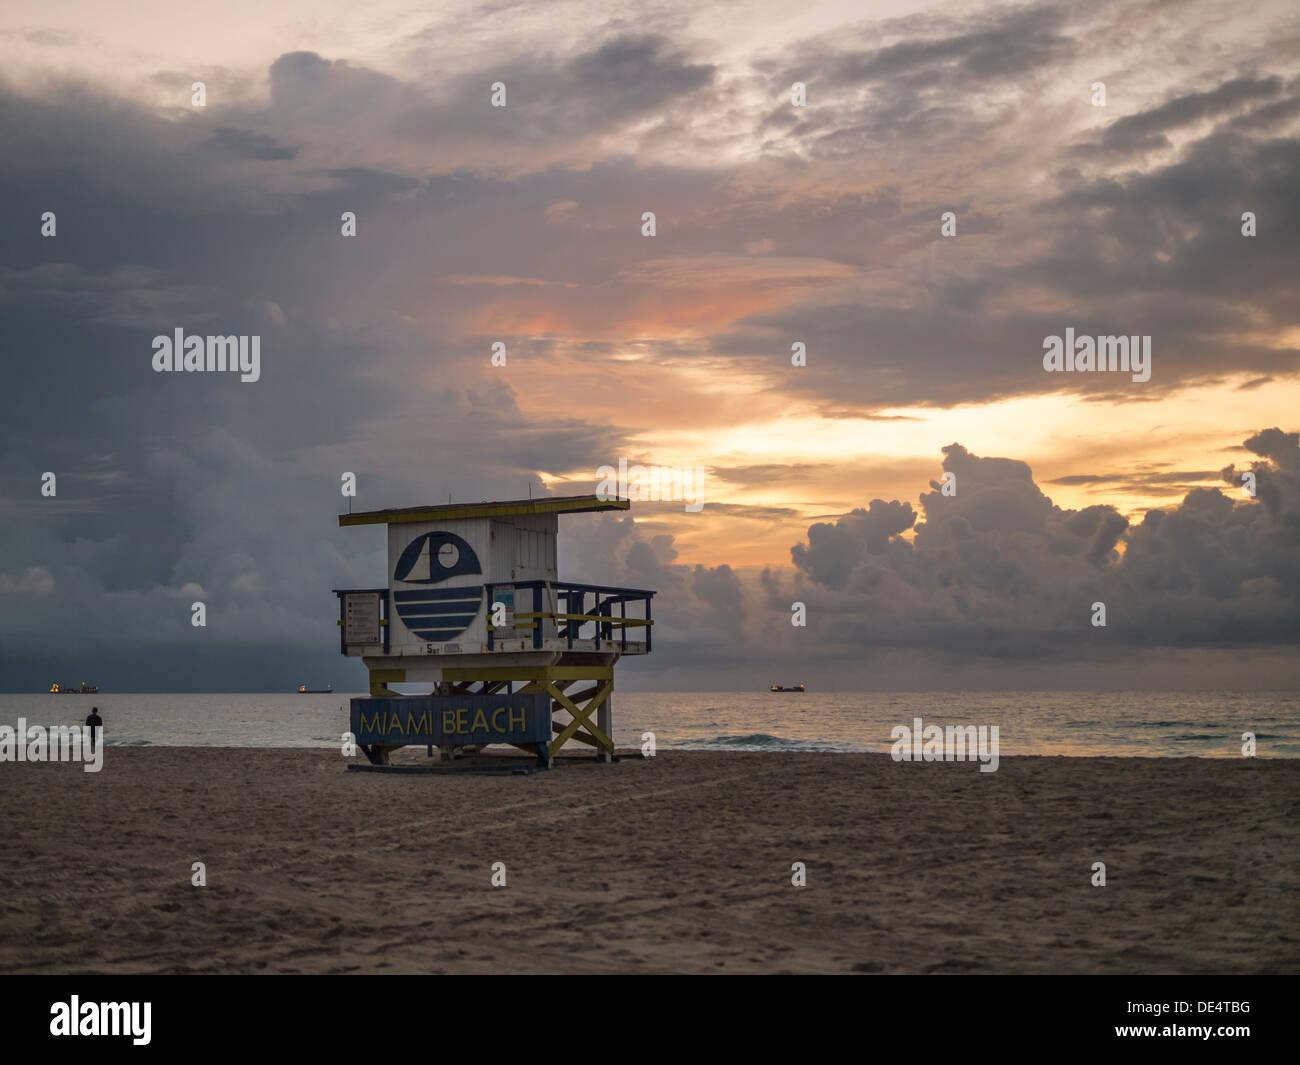 Miami Beach Sunrise.Florida. USA - Stock Image